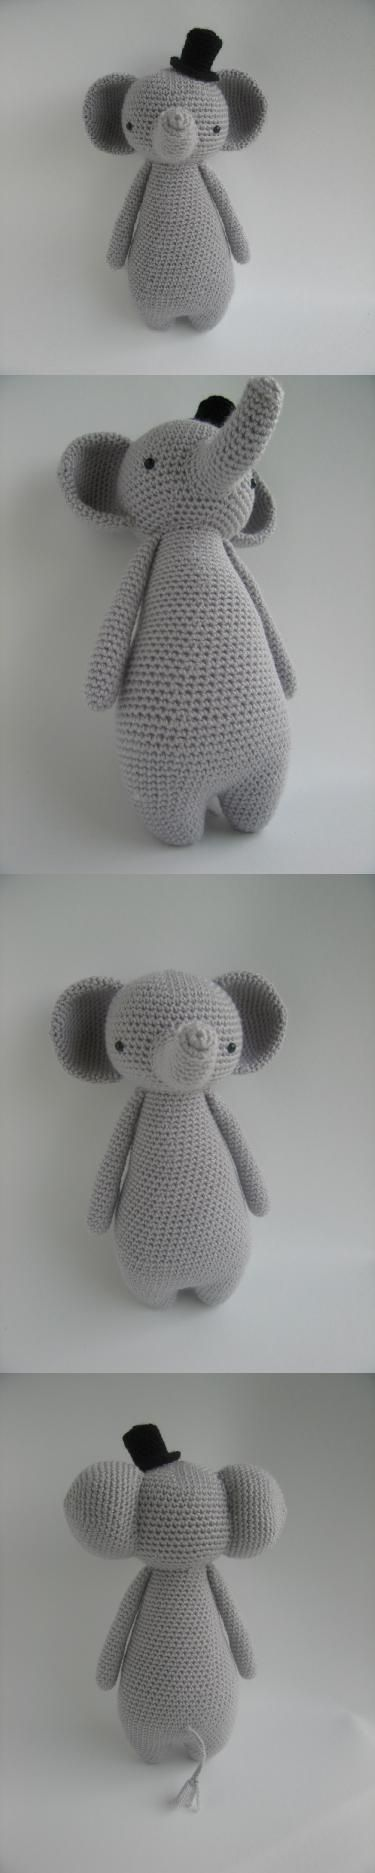 Tall Elephant With Hat Amigurumi Pattern